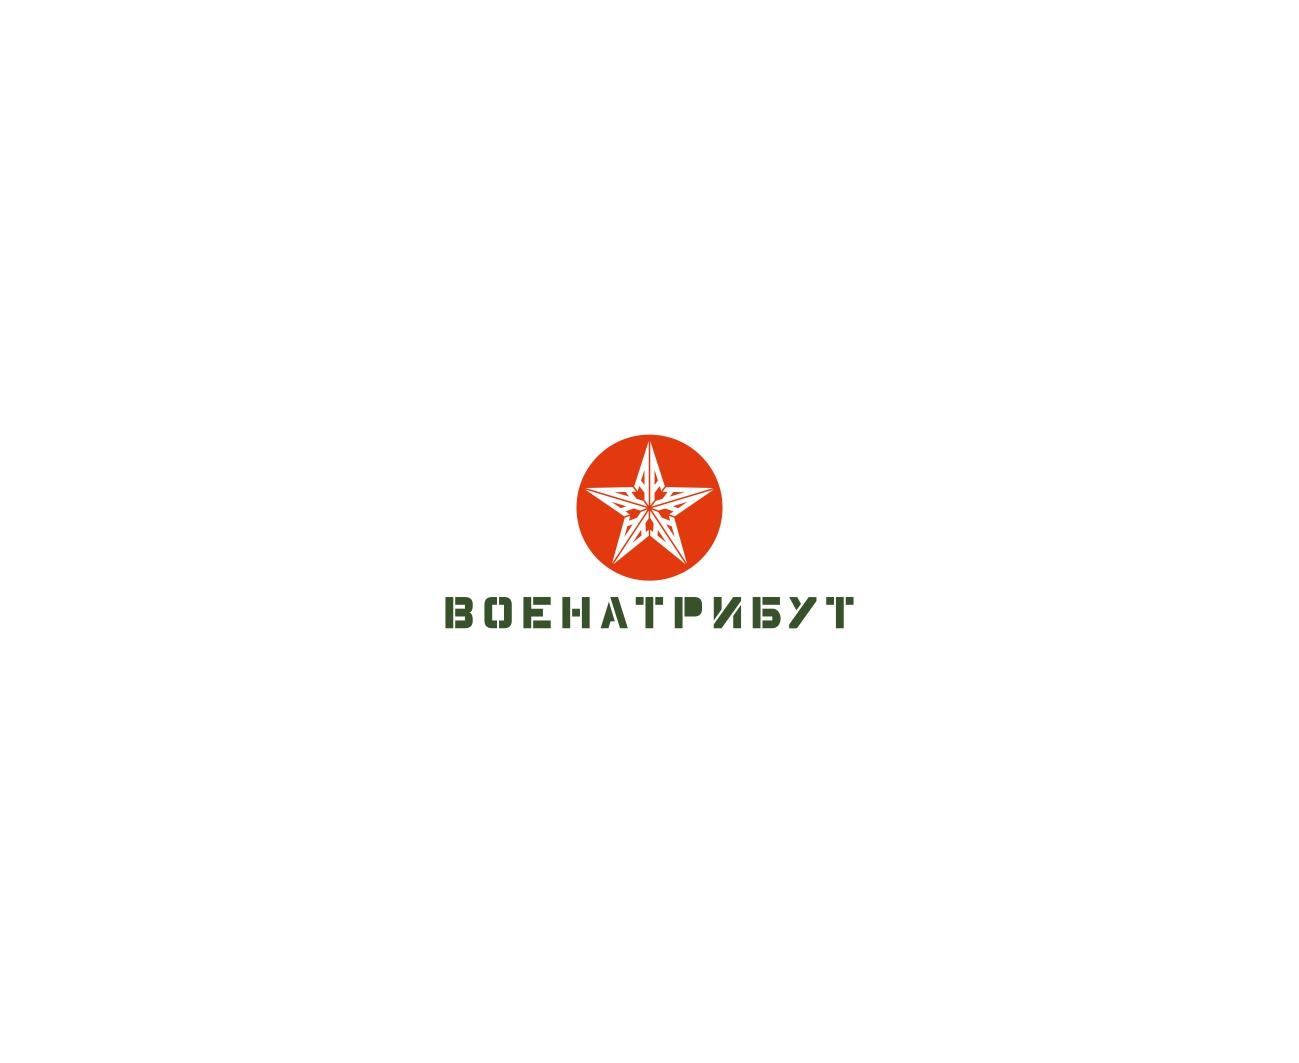 Разработка логотипа для компании военной тематики фото f_967601beb254fee4.jpg